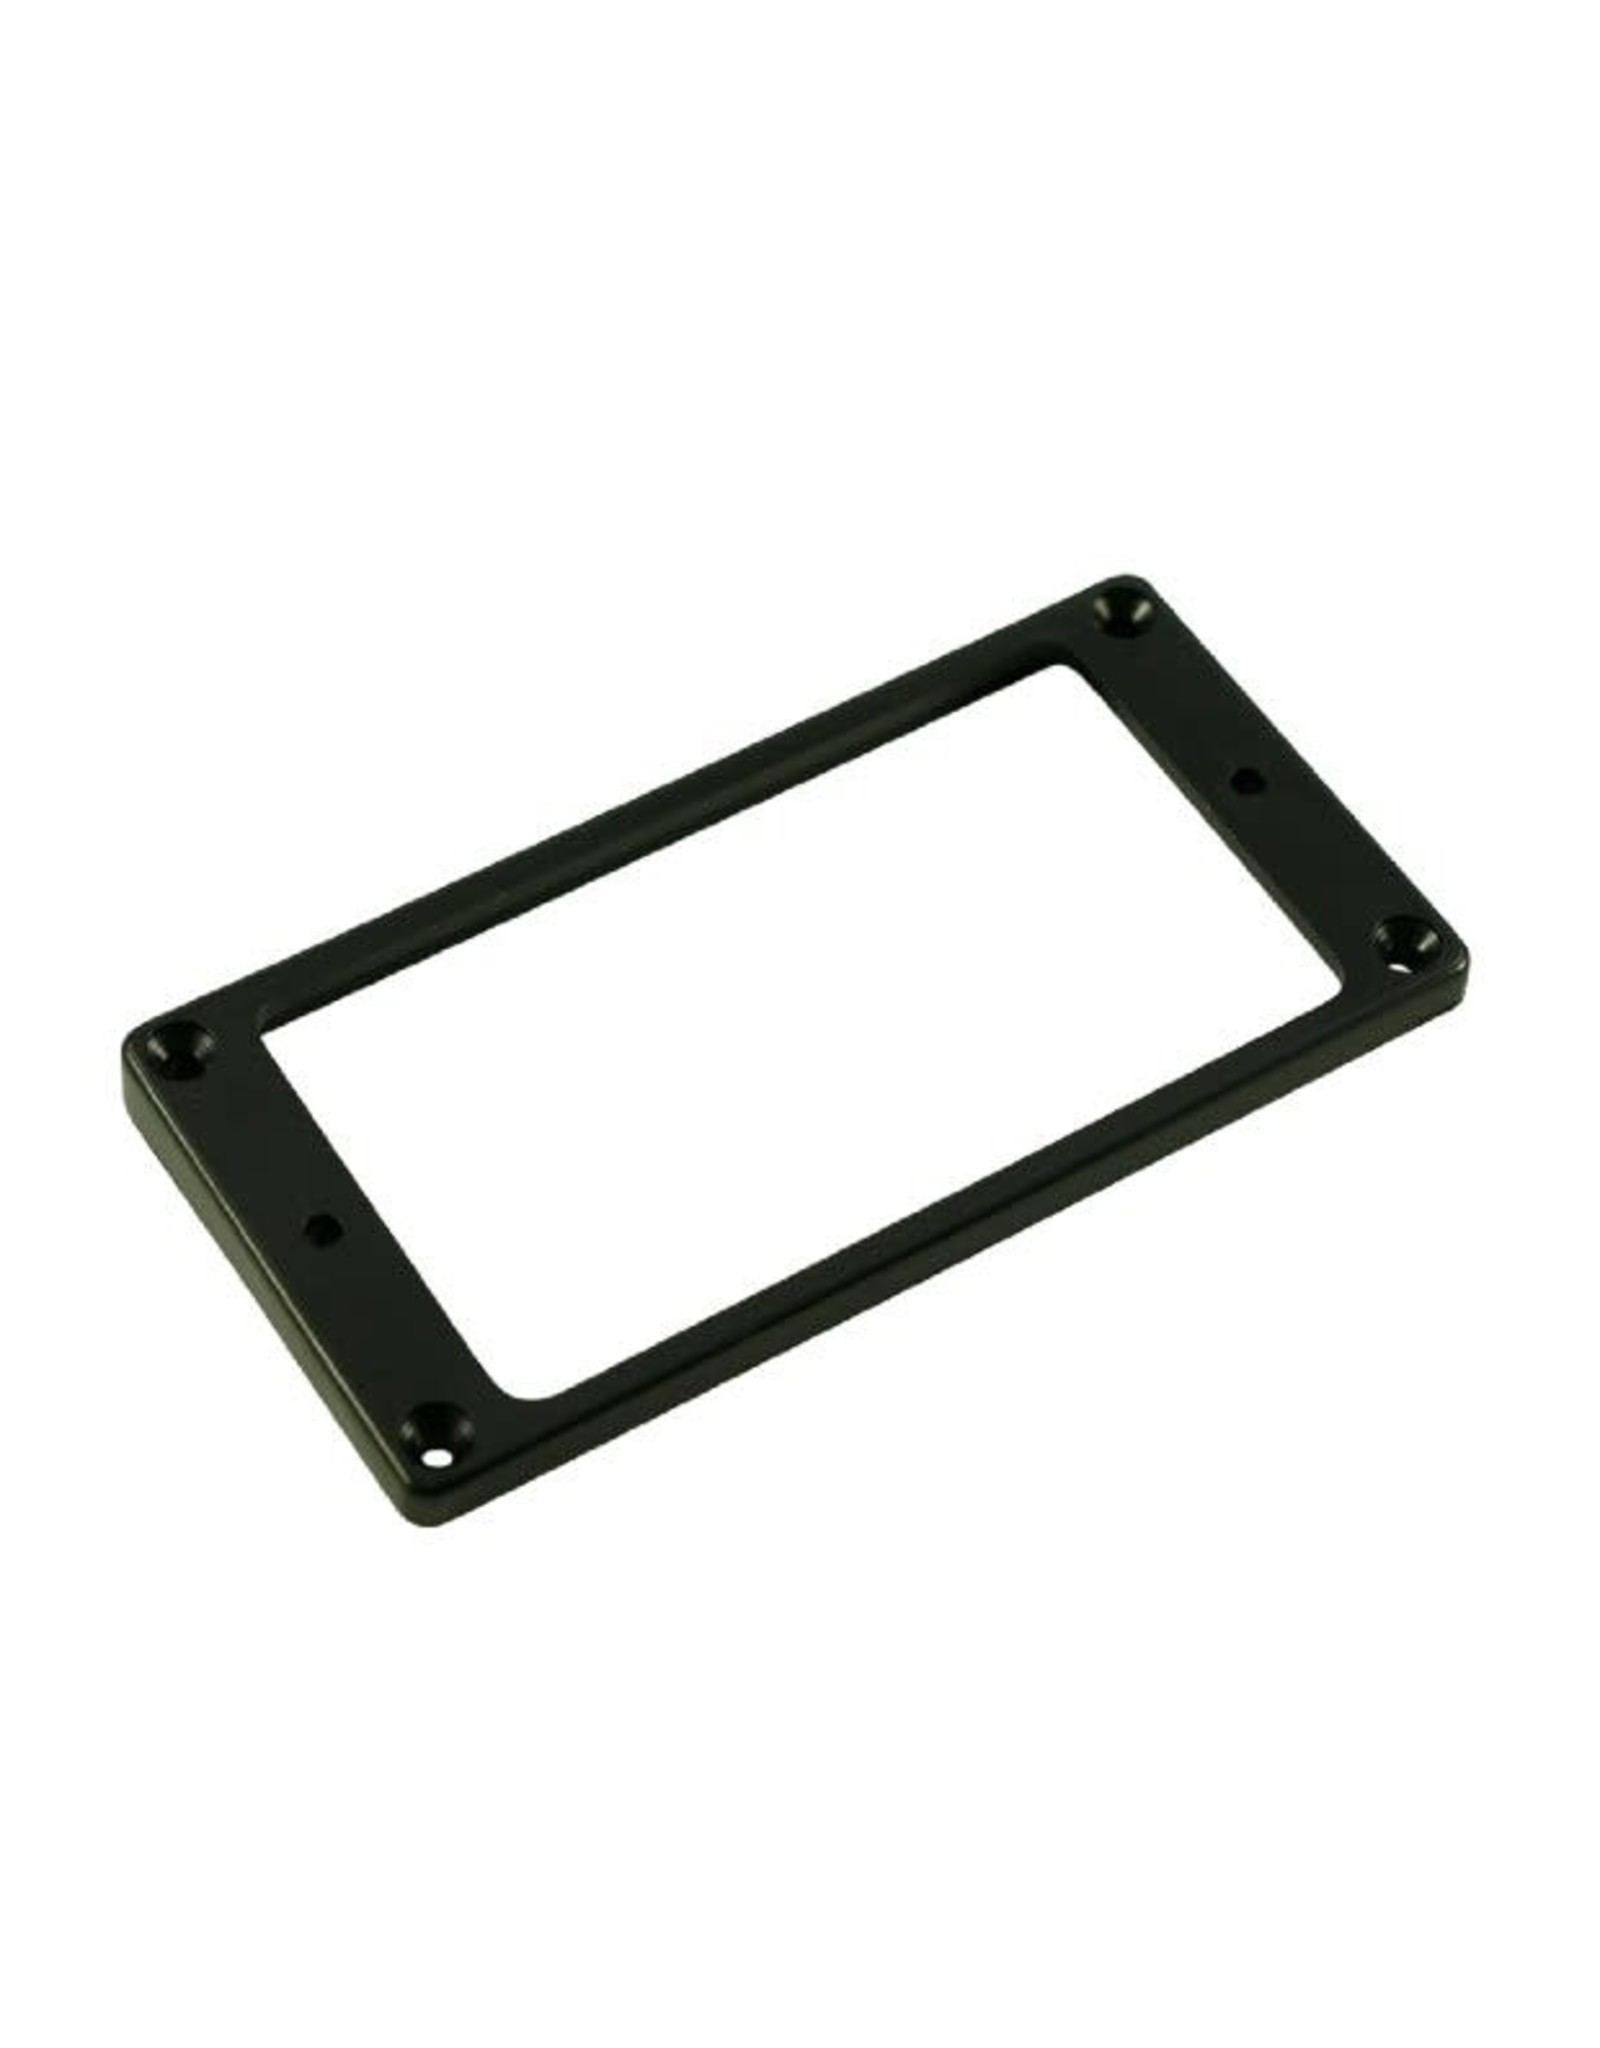 WD Music Products WD Flat Medium Plastic Humbucker Pickup Mounting Ring Black